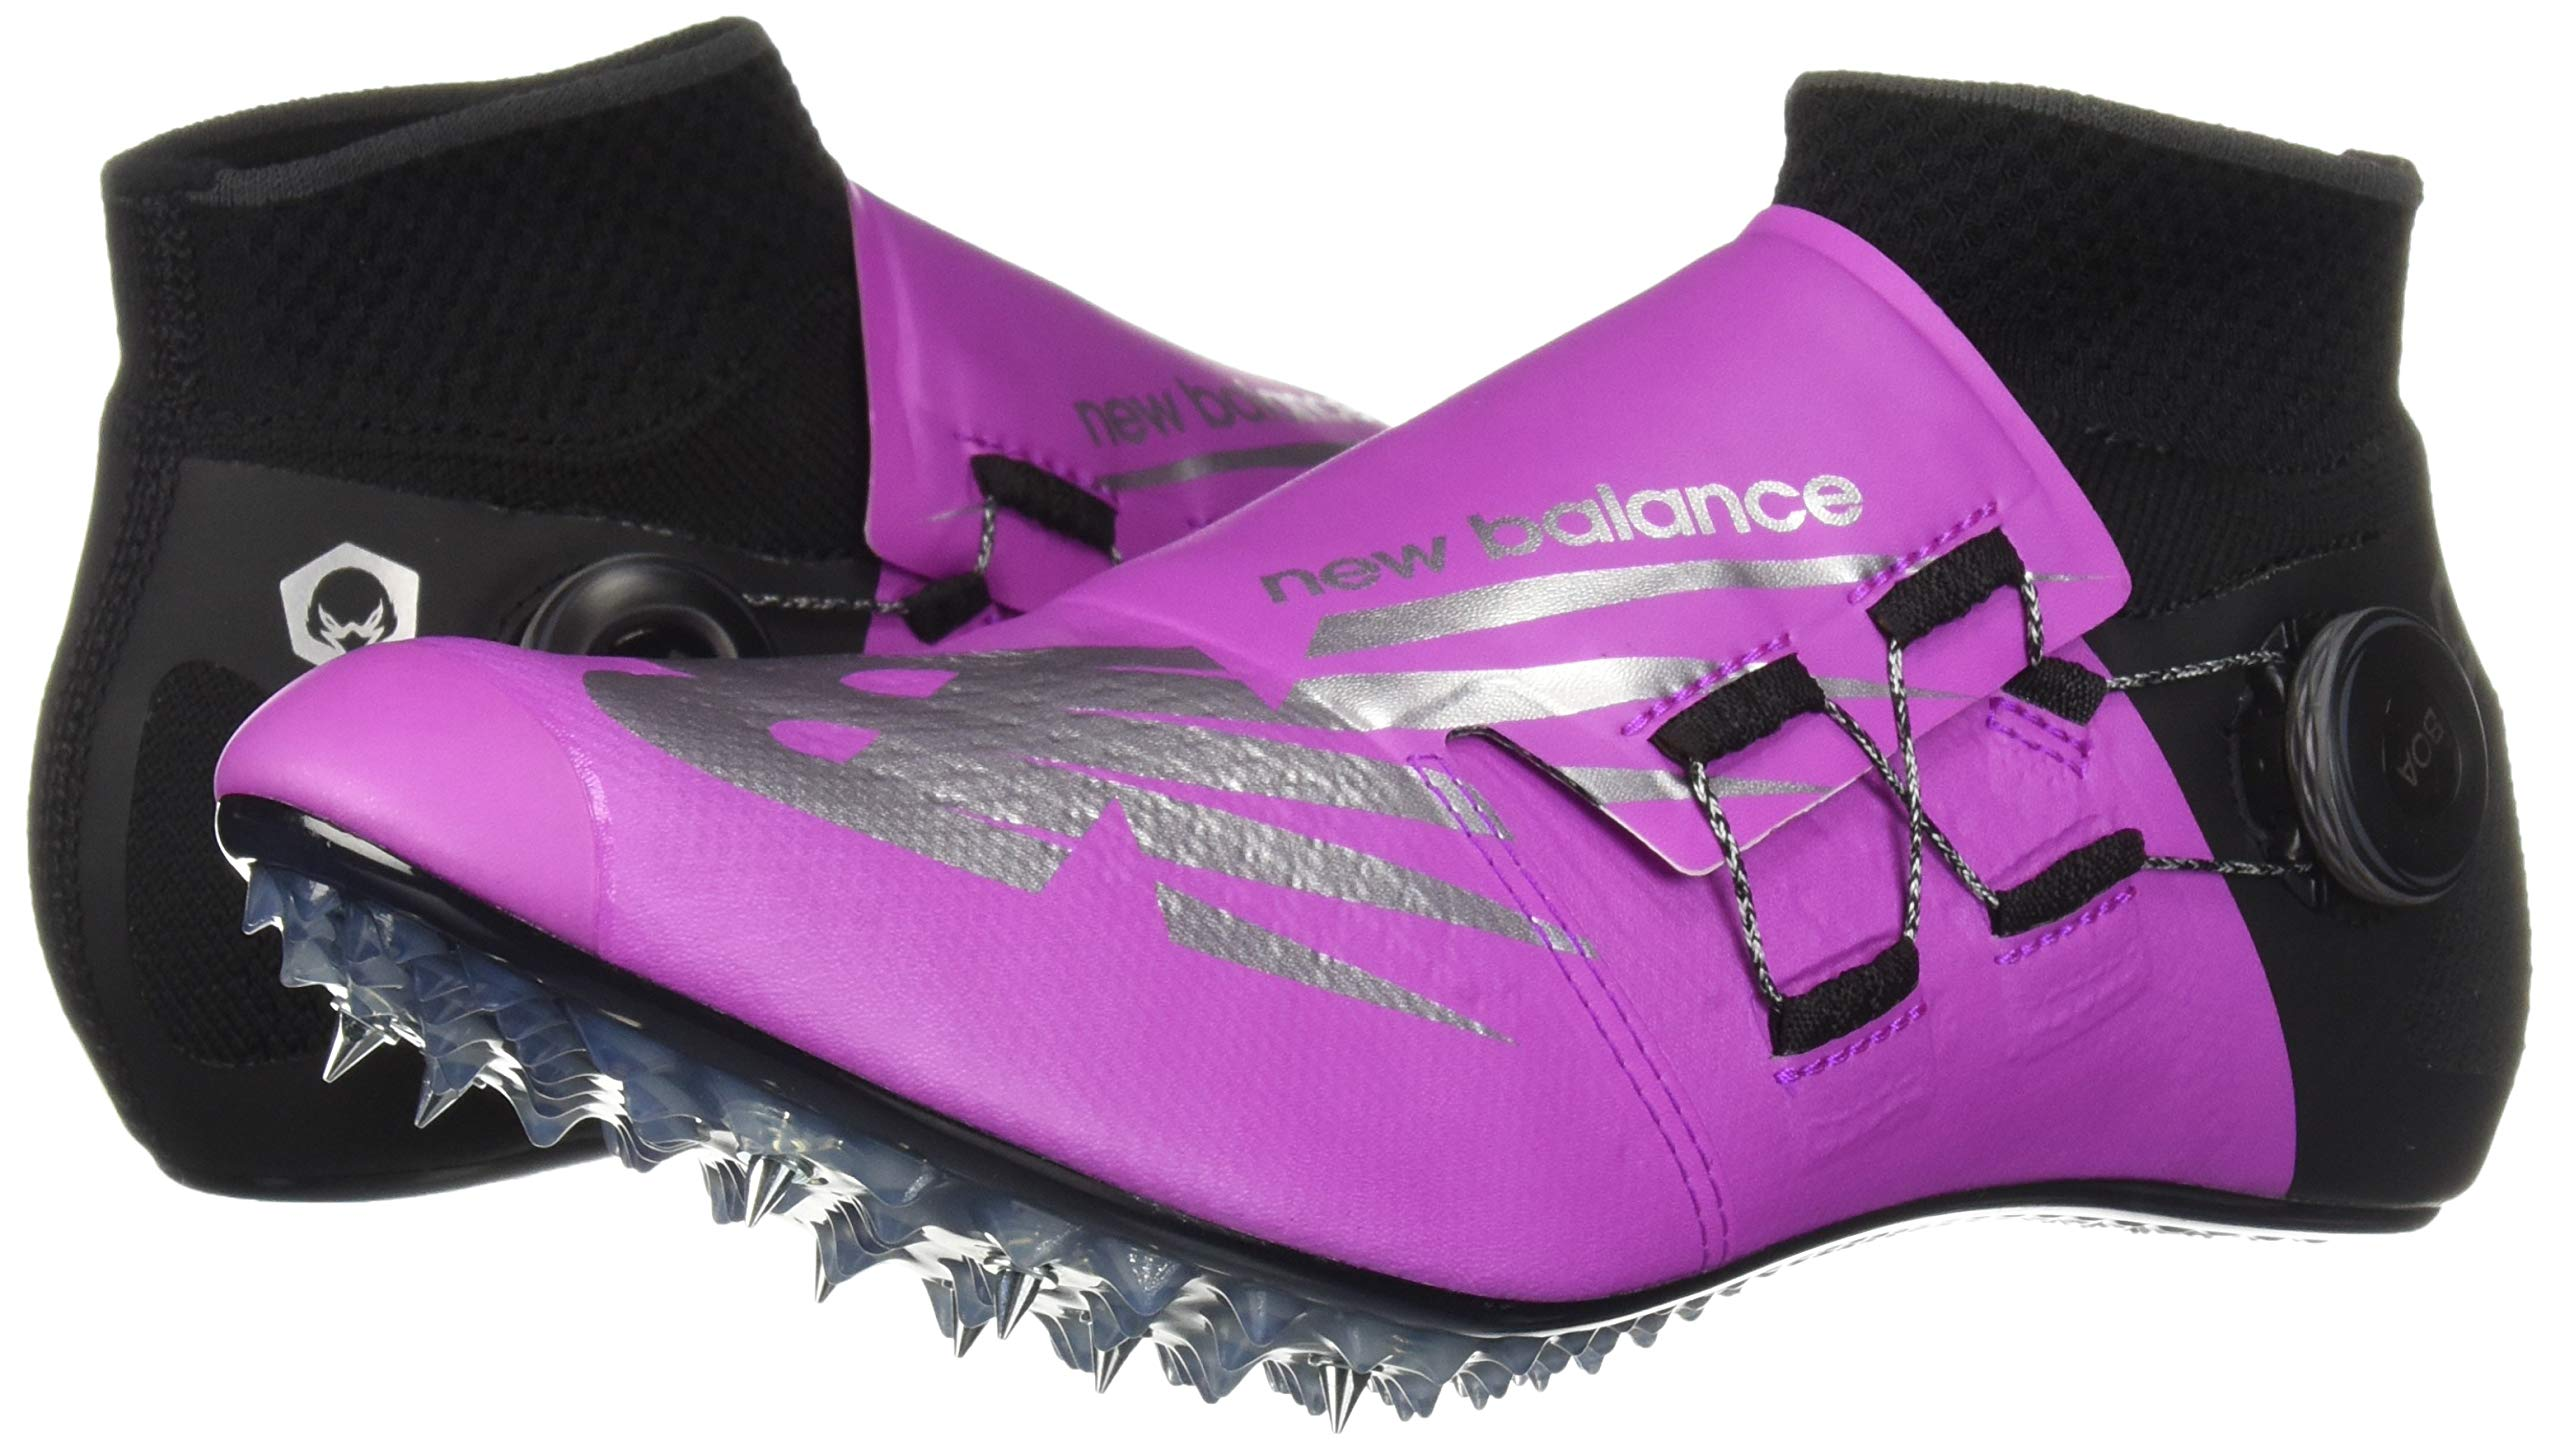 New Balance Men's Sigma Harmony Vazee Track Shoe Voltage Violet/Black 4.5 D US by New Balance (Image #6)